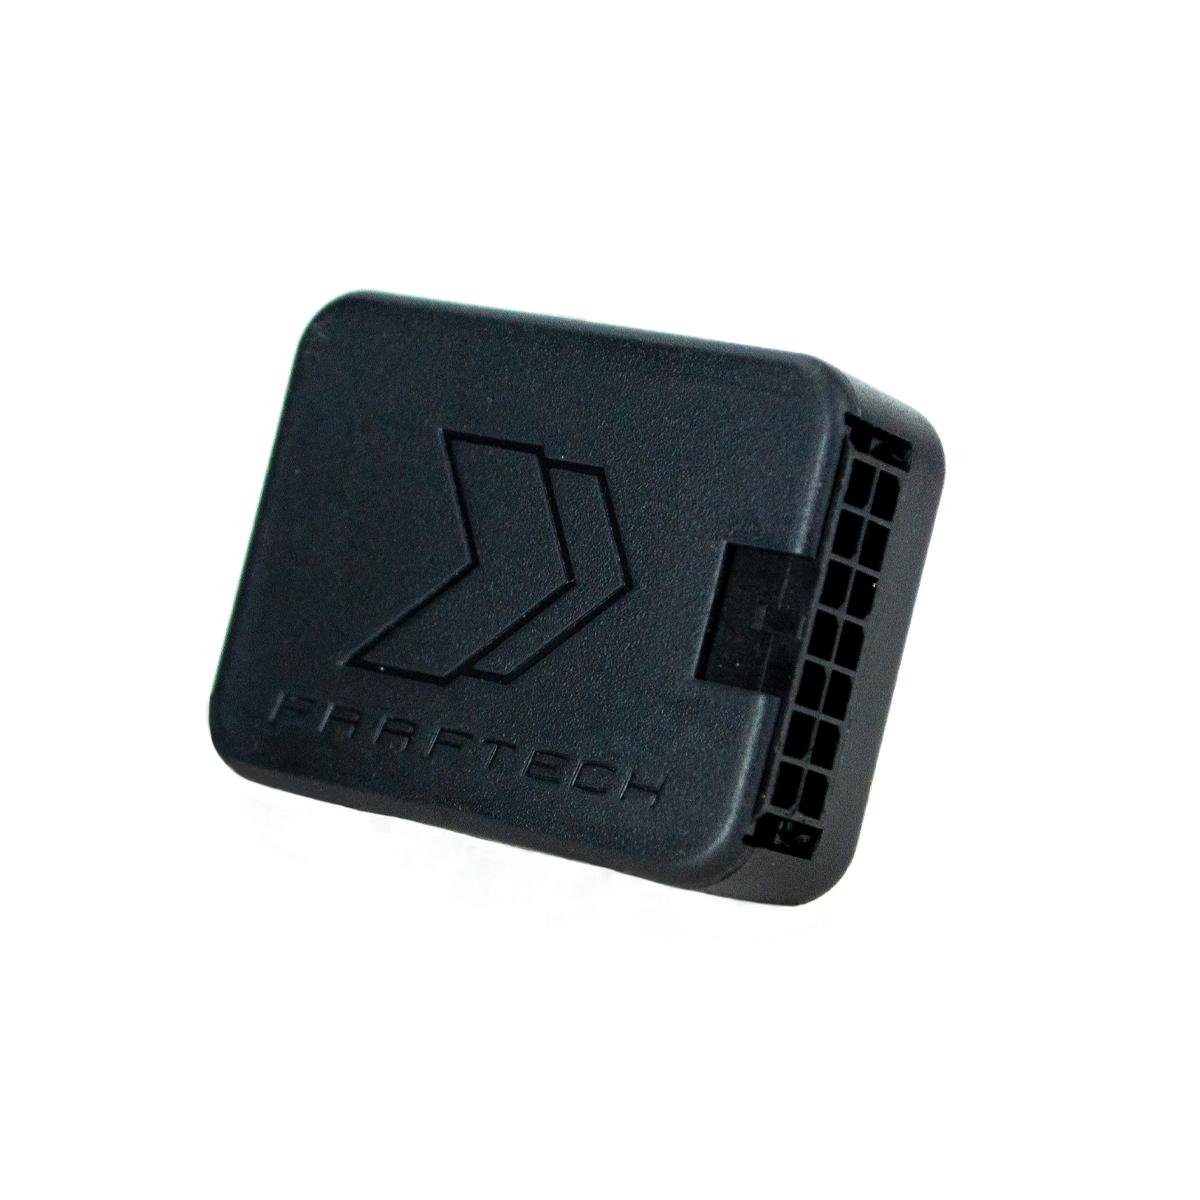 Chip de Pedal Shiftpower Para Mitsubishi Pajero Full